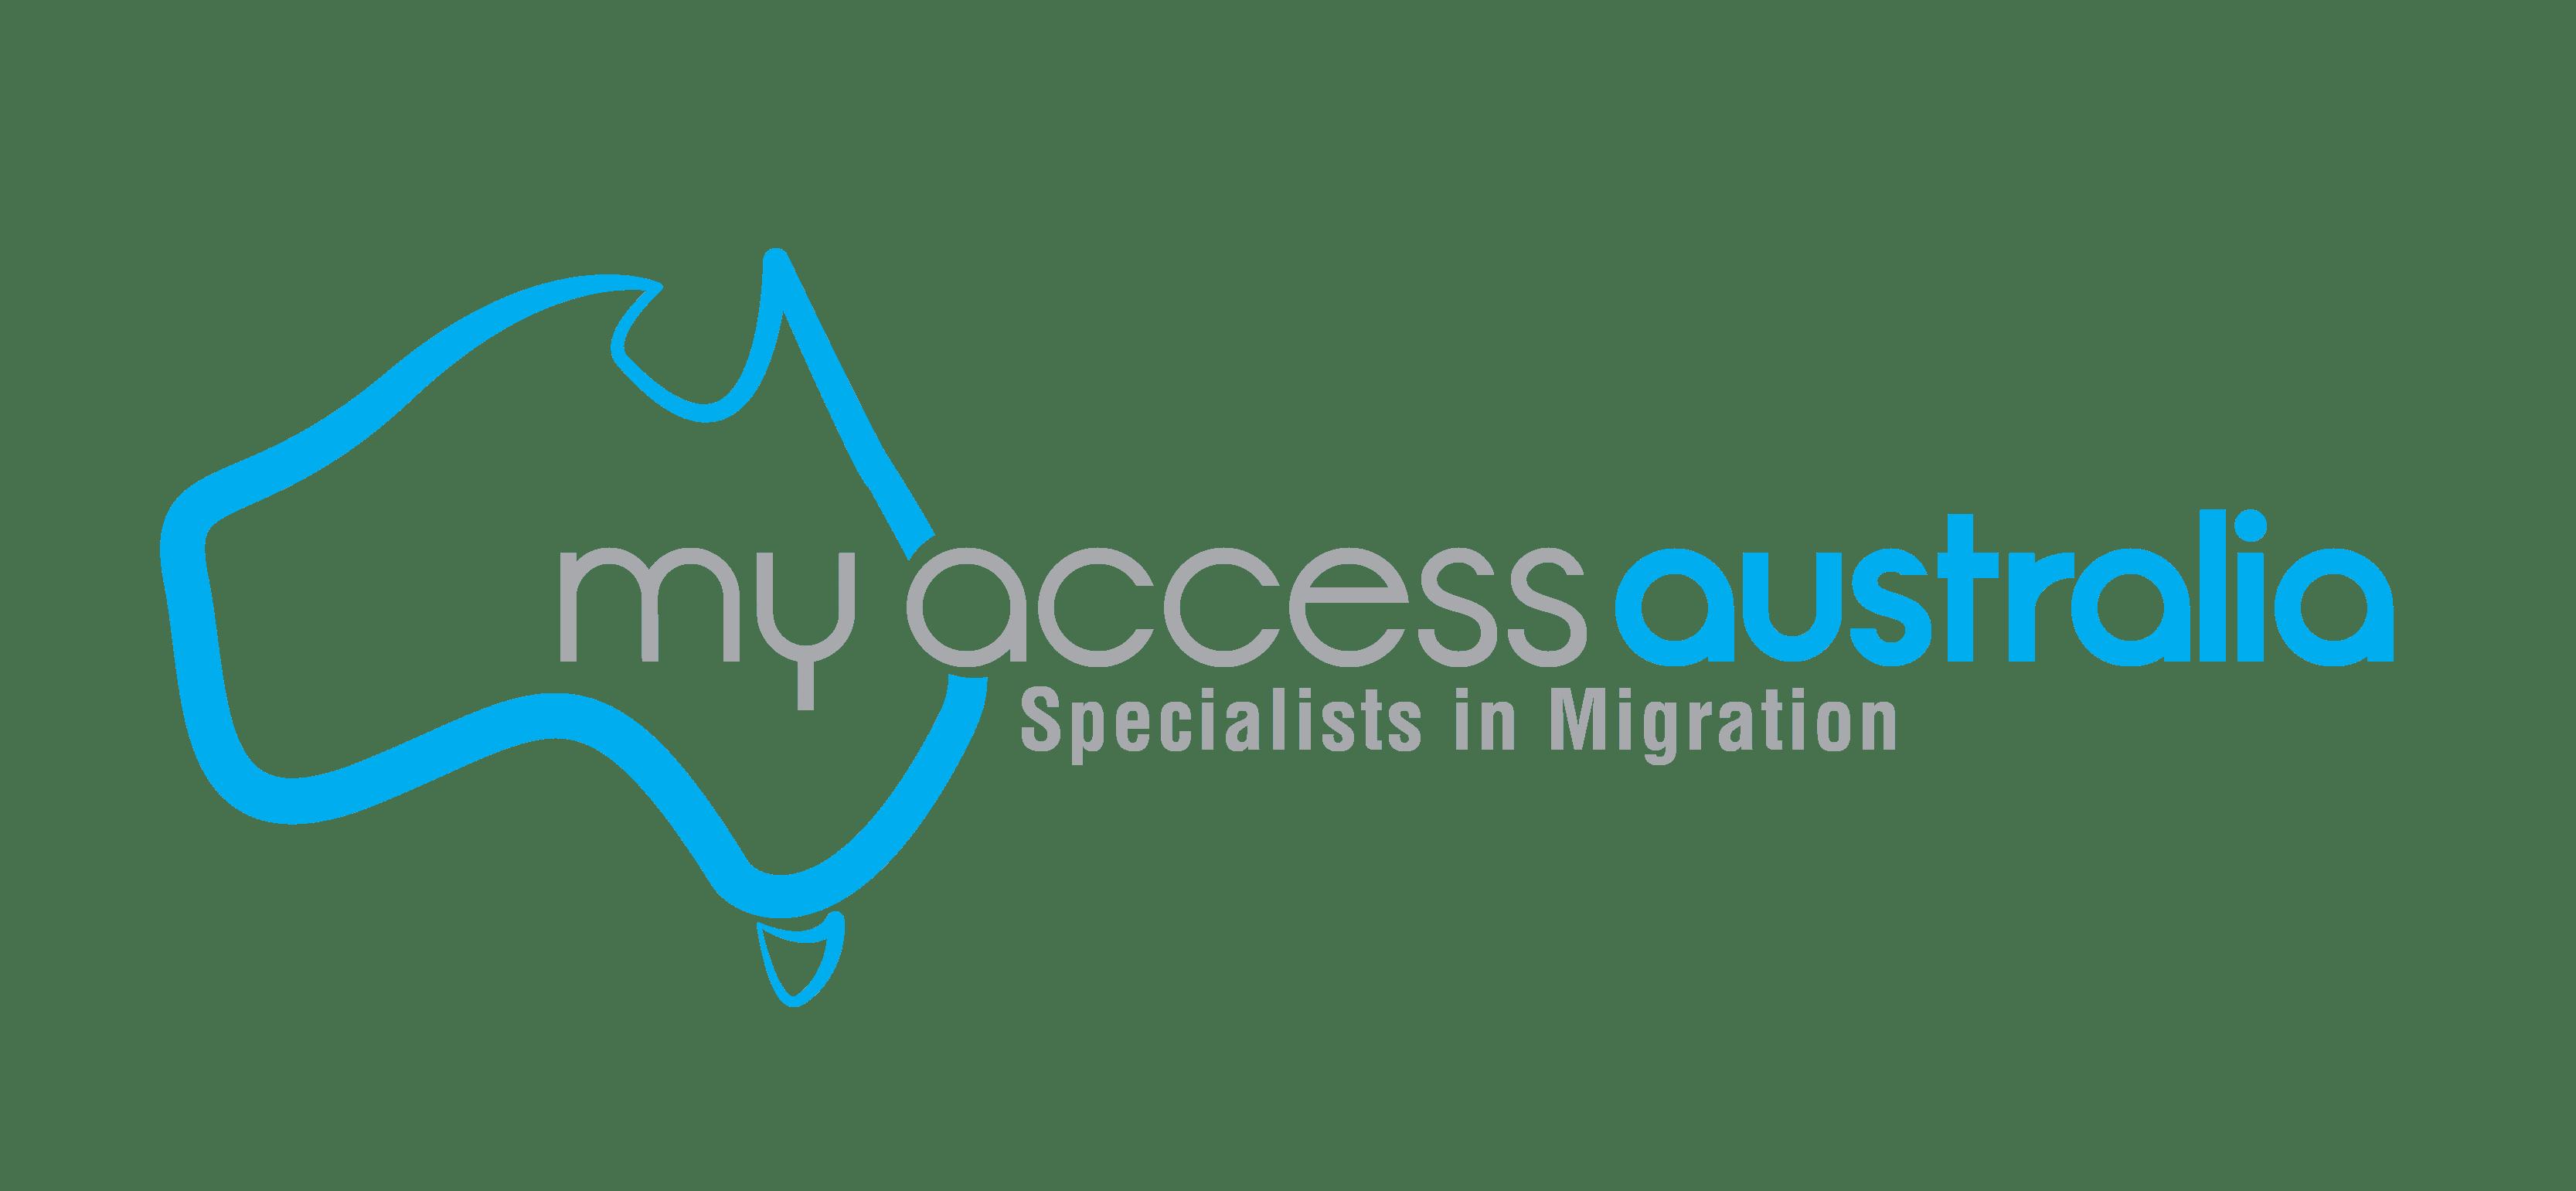 Migration Agent, Sydney - My Access Australia